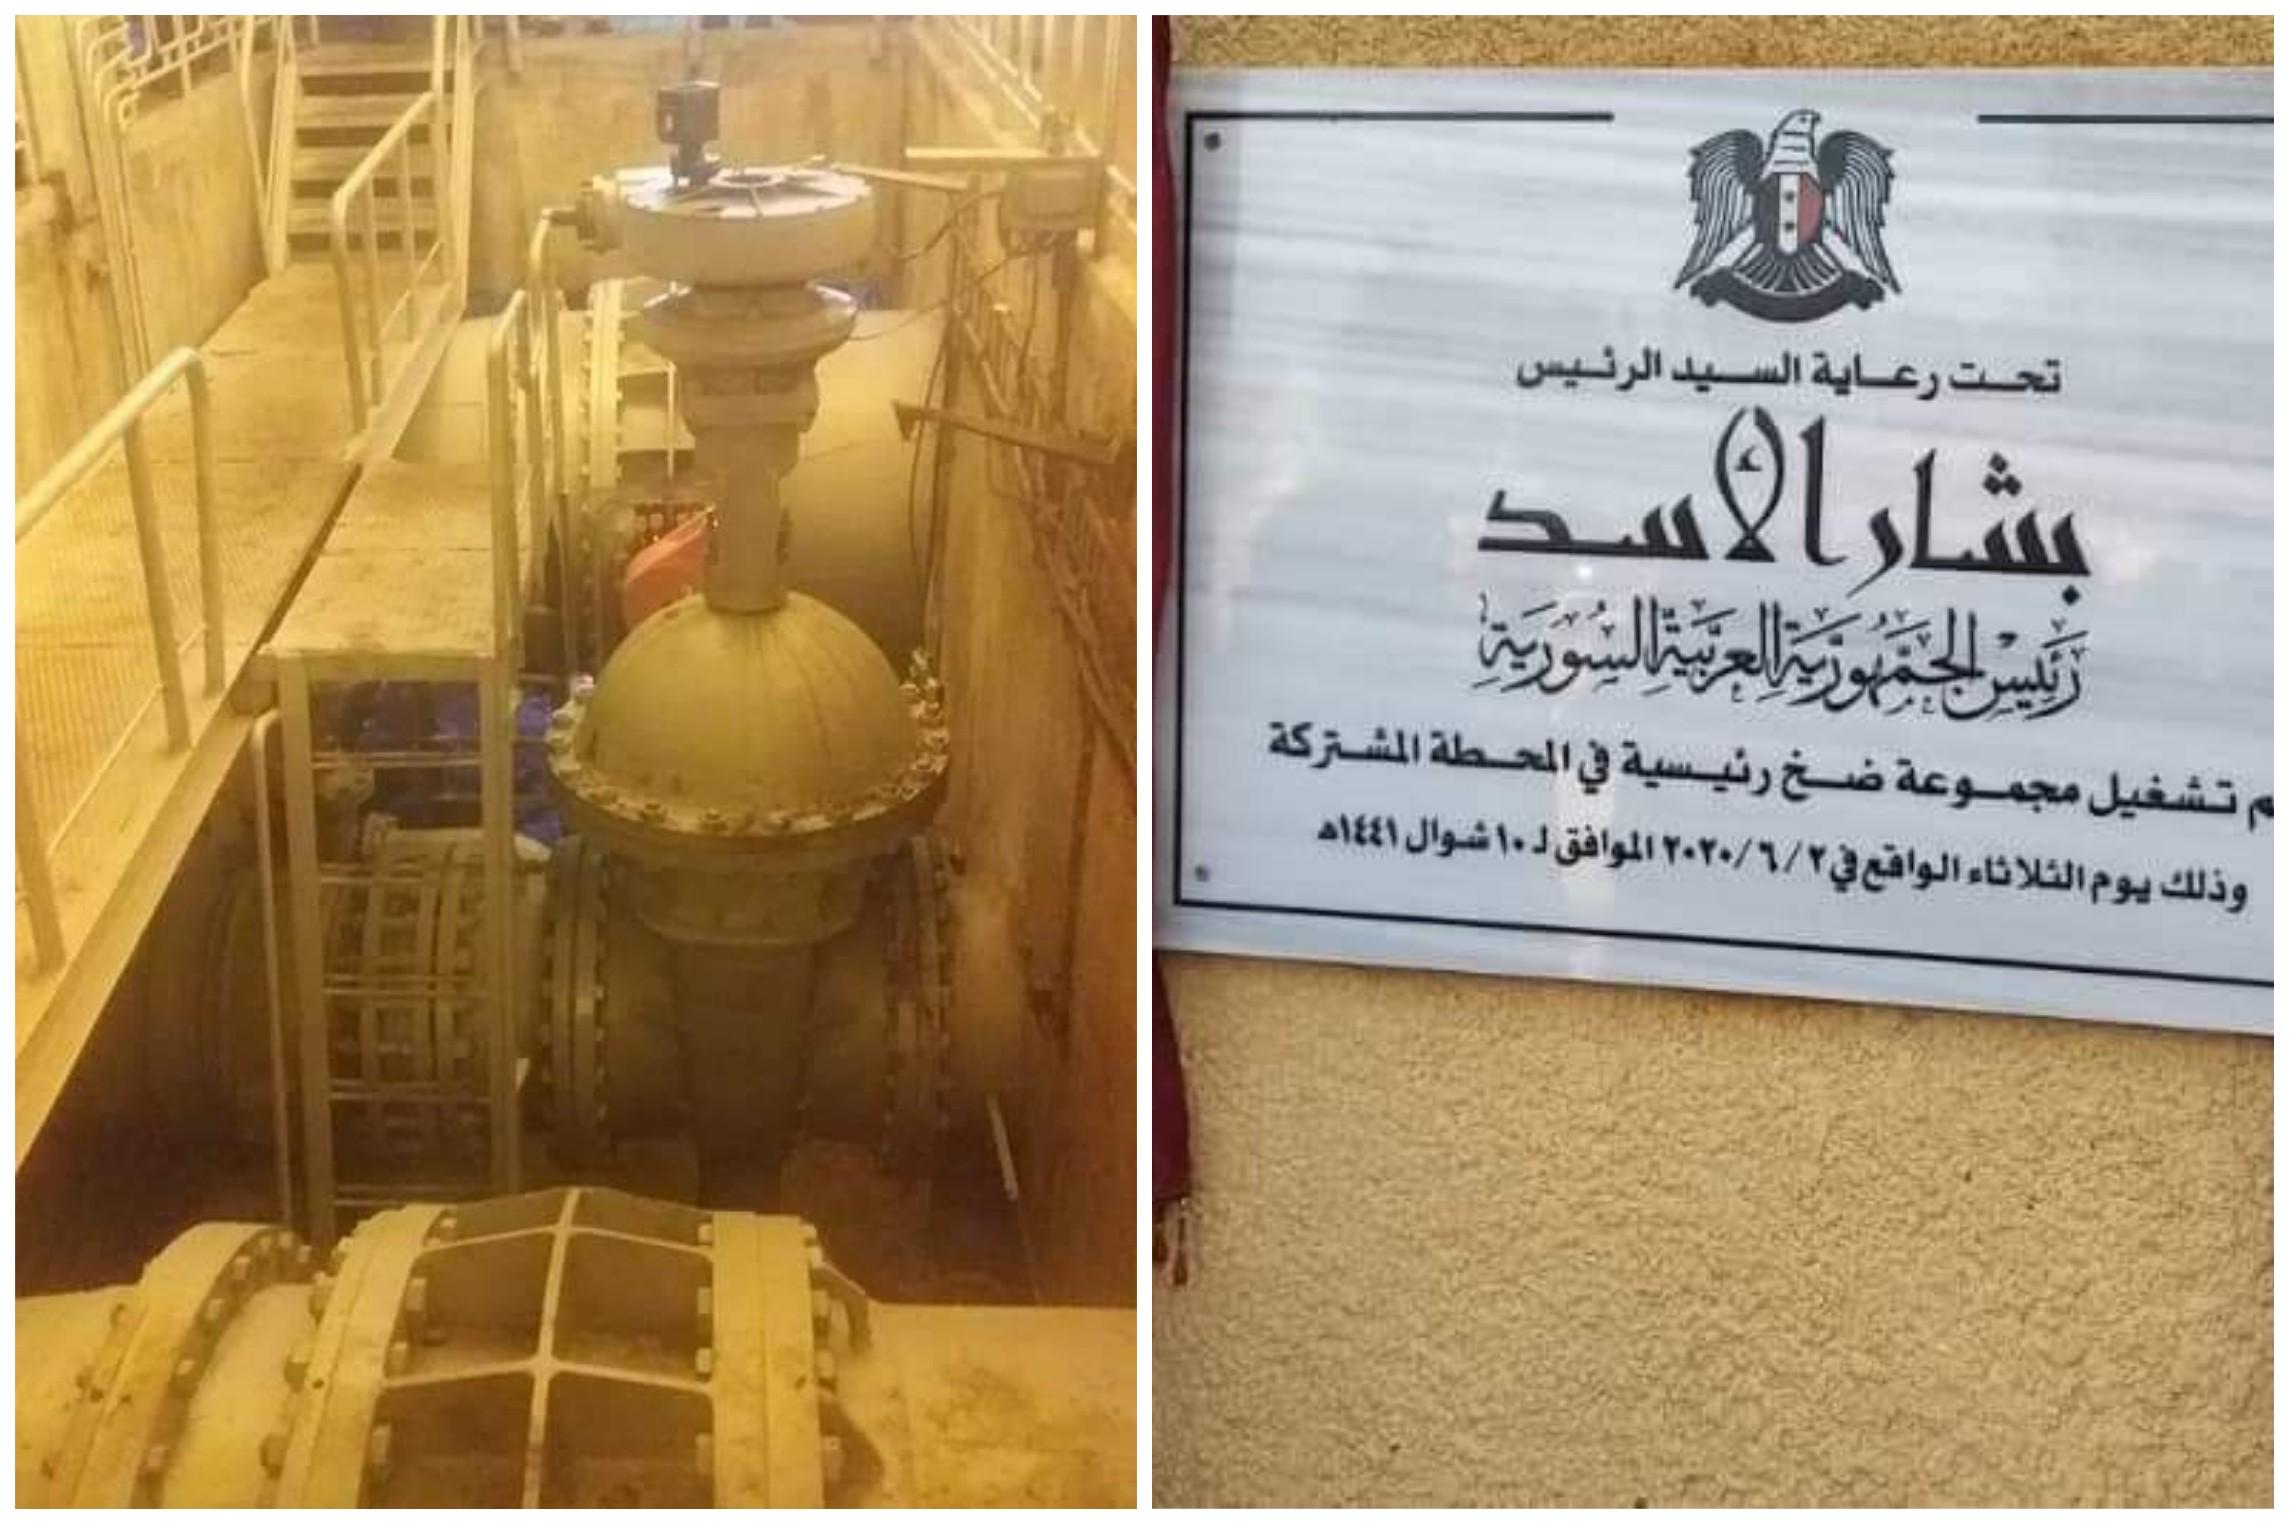 Photo of بخبرة وطنية ورعاية الرئيس الأسد.. إعادة تشغيل أكبر محطة ضخ مياه بريف حلب